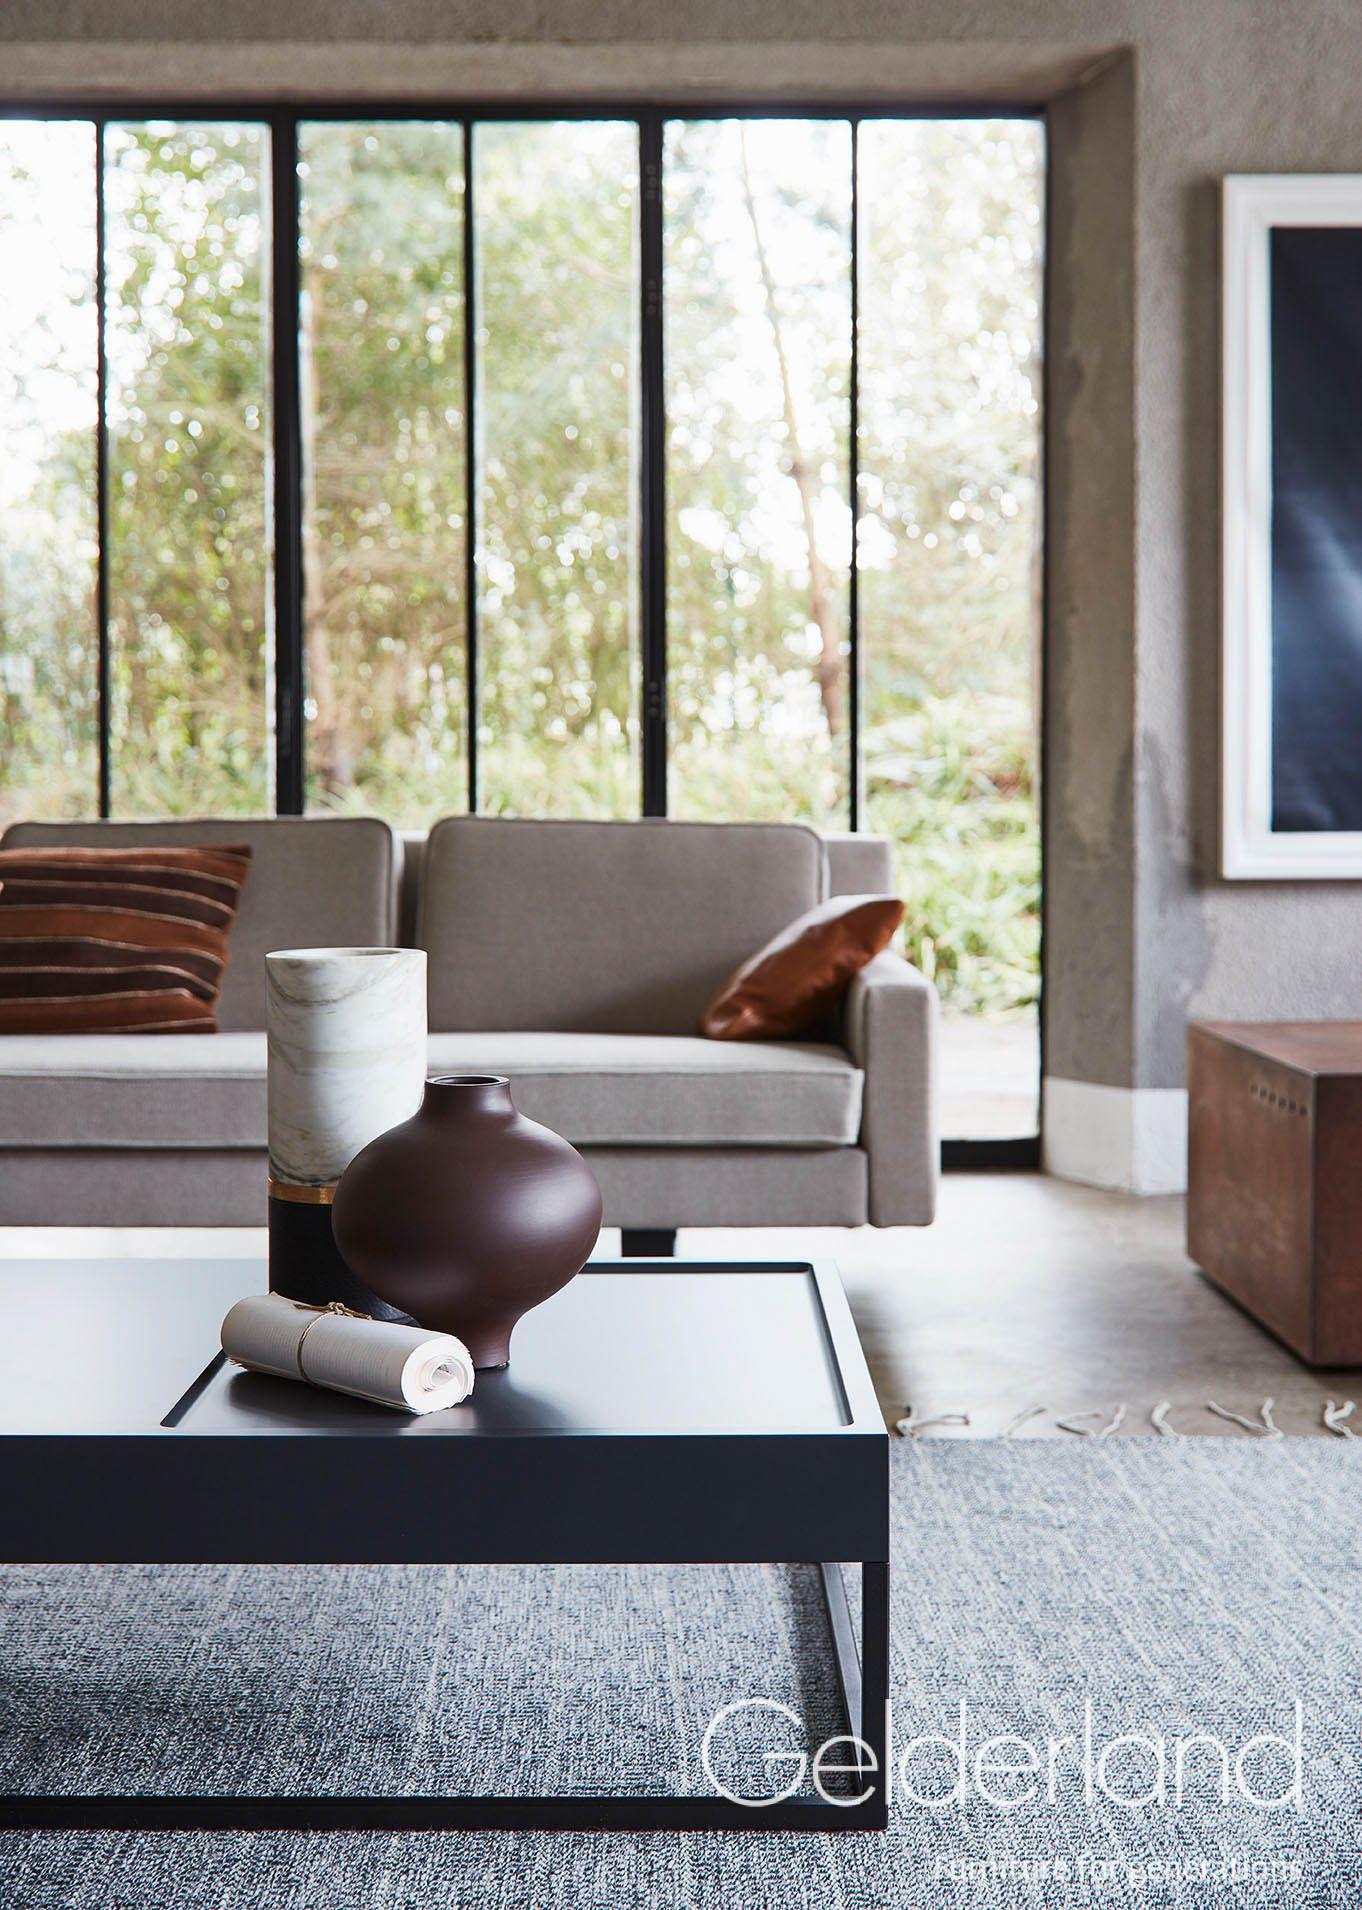 meijers furniture. Gelderland Tafel 7852 By Remy Meijers #gelderland #dutchdesign #interieur\u2026 Furniture